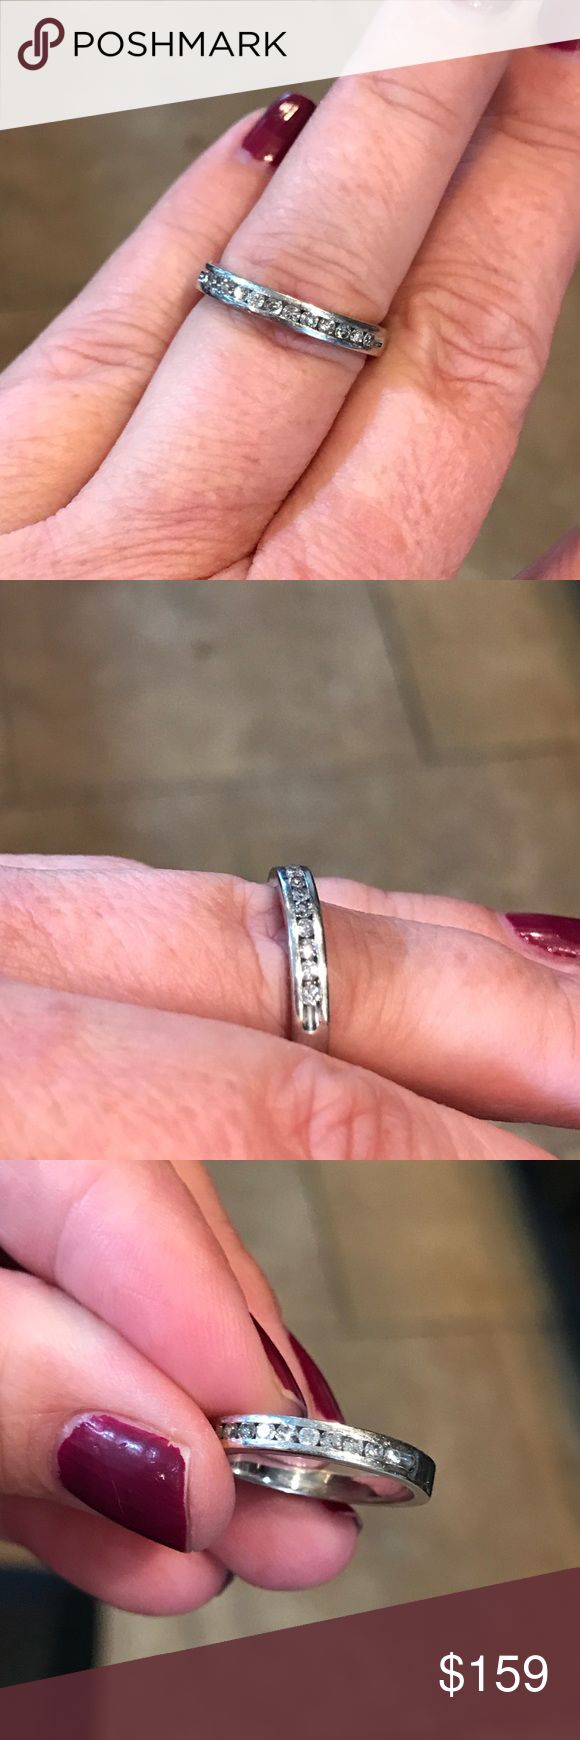 14KWG Channel set diamond band ring. 1/3 carat 14 karat white gold channel set diamond band ring. 1/3 of a carat diamond total weight. Size 6. Needs a buff. Jewelry Rings